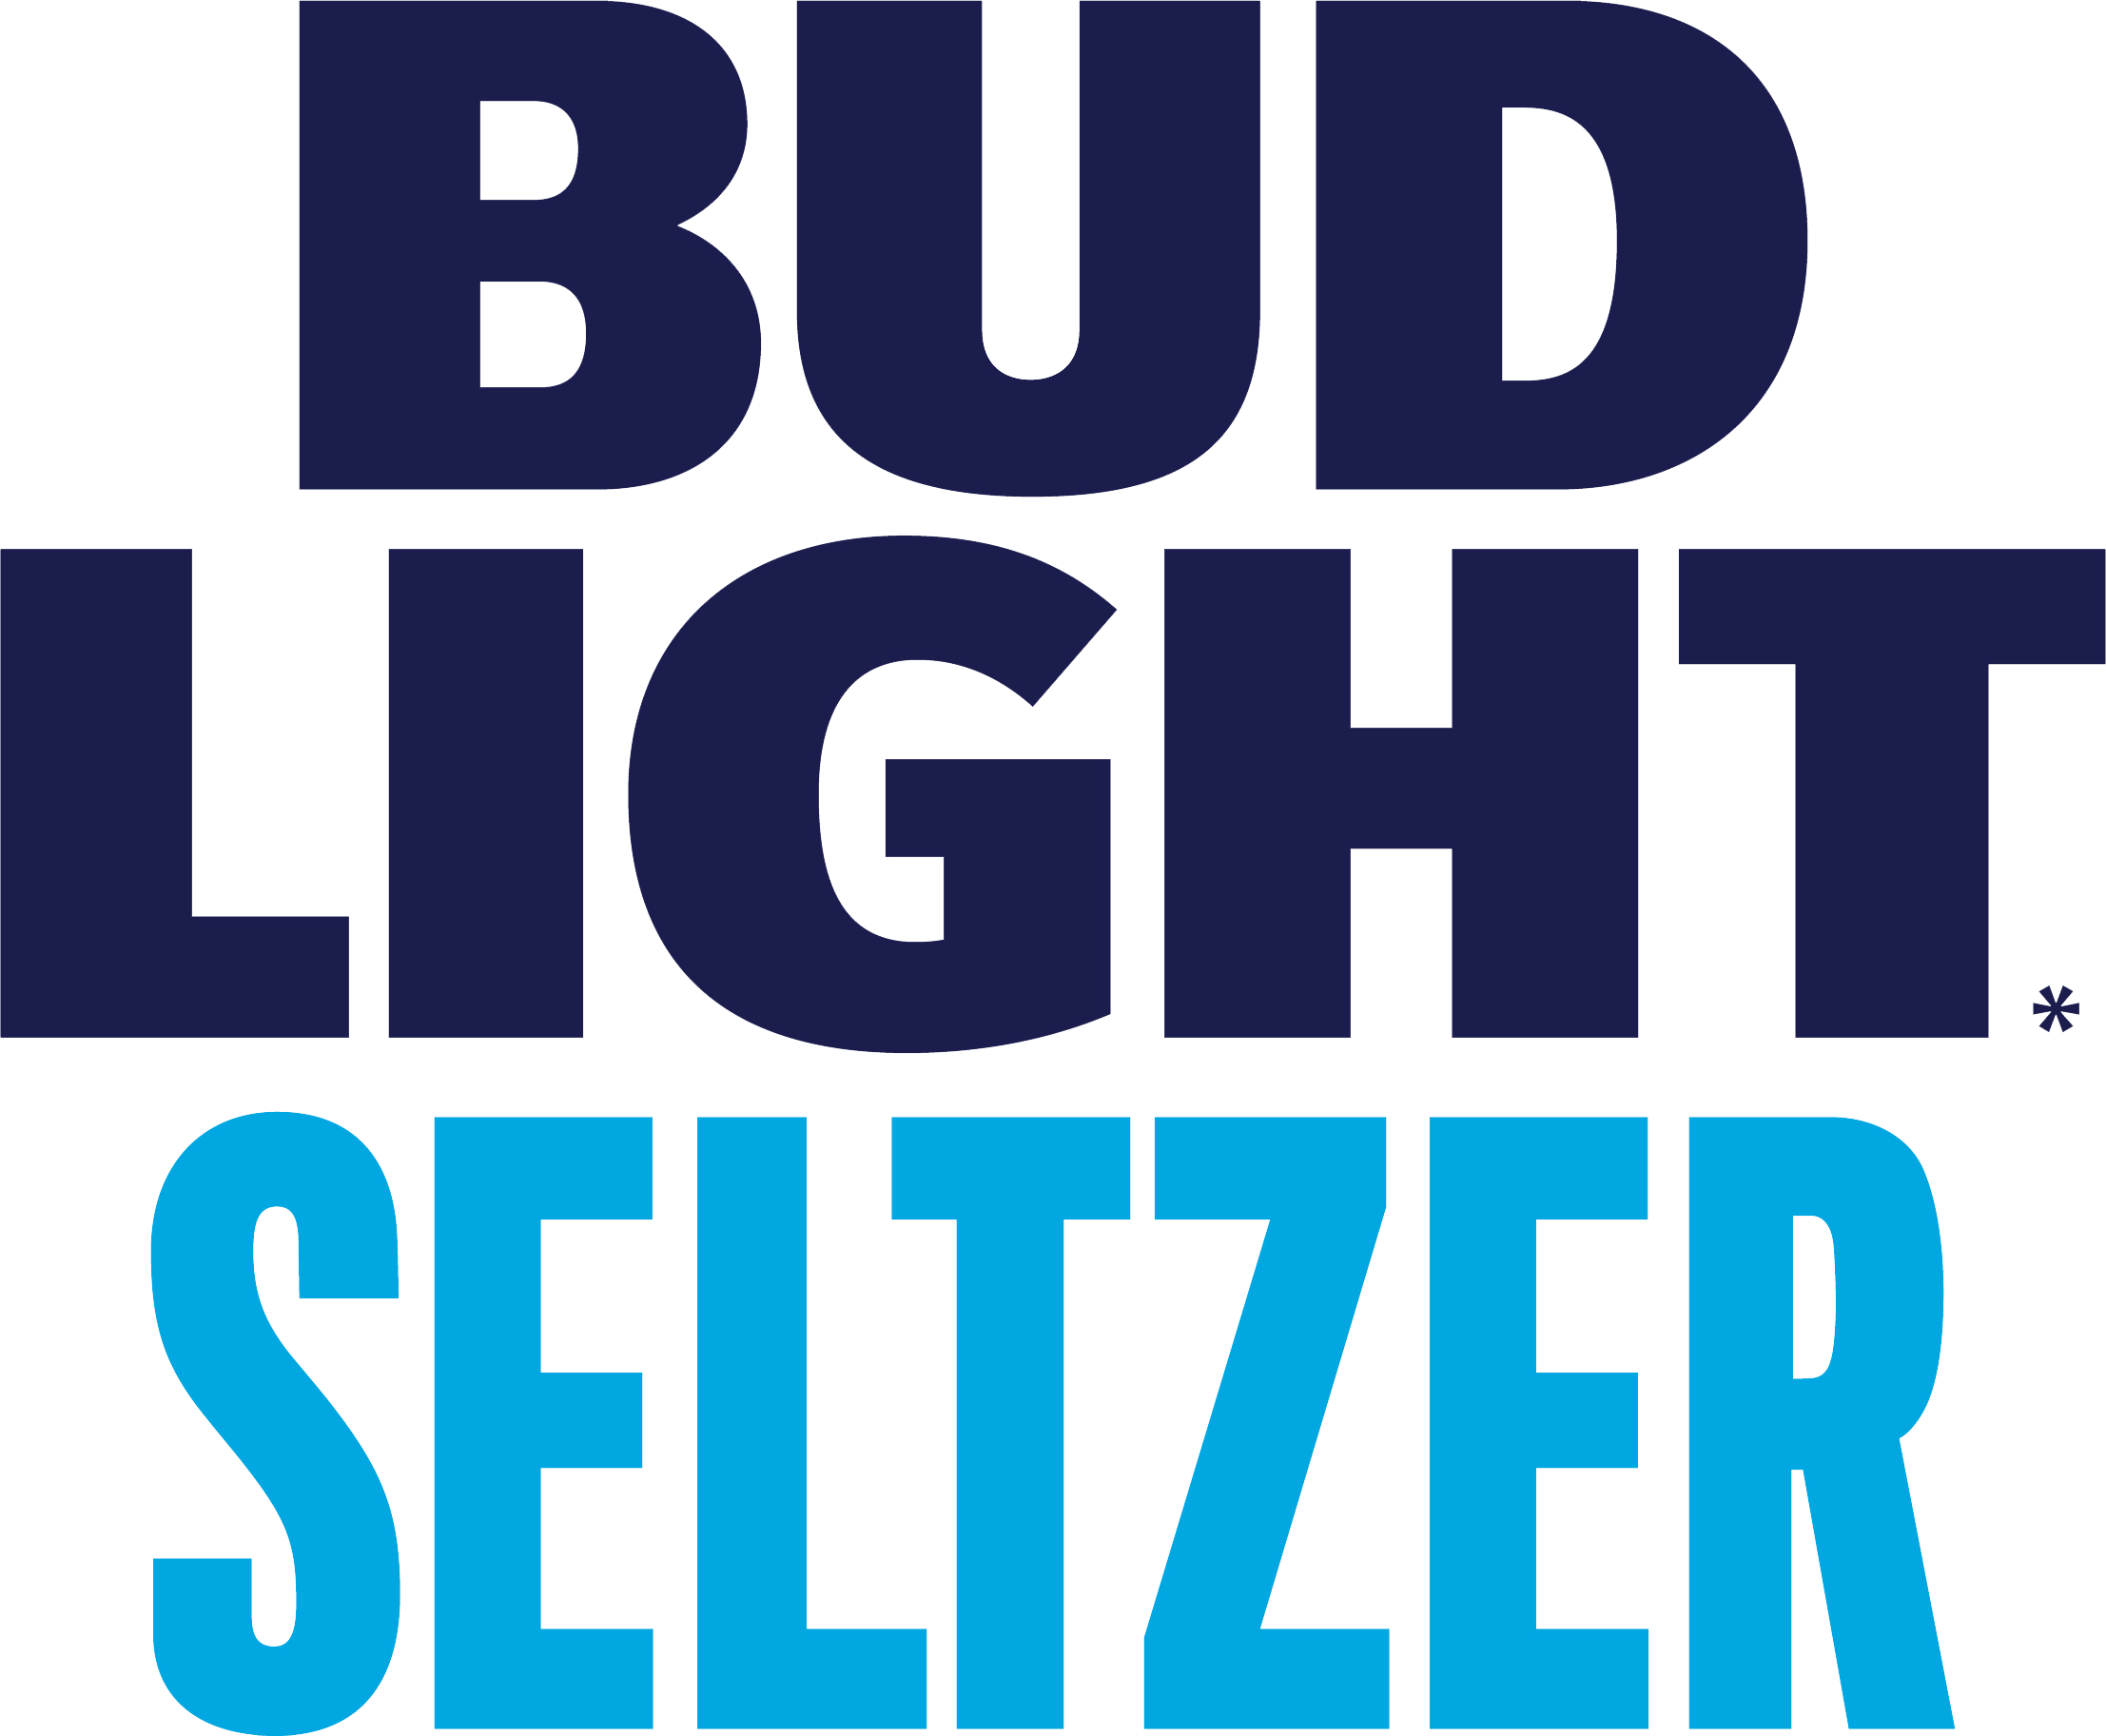 Budlight seltzer